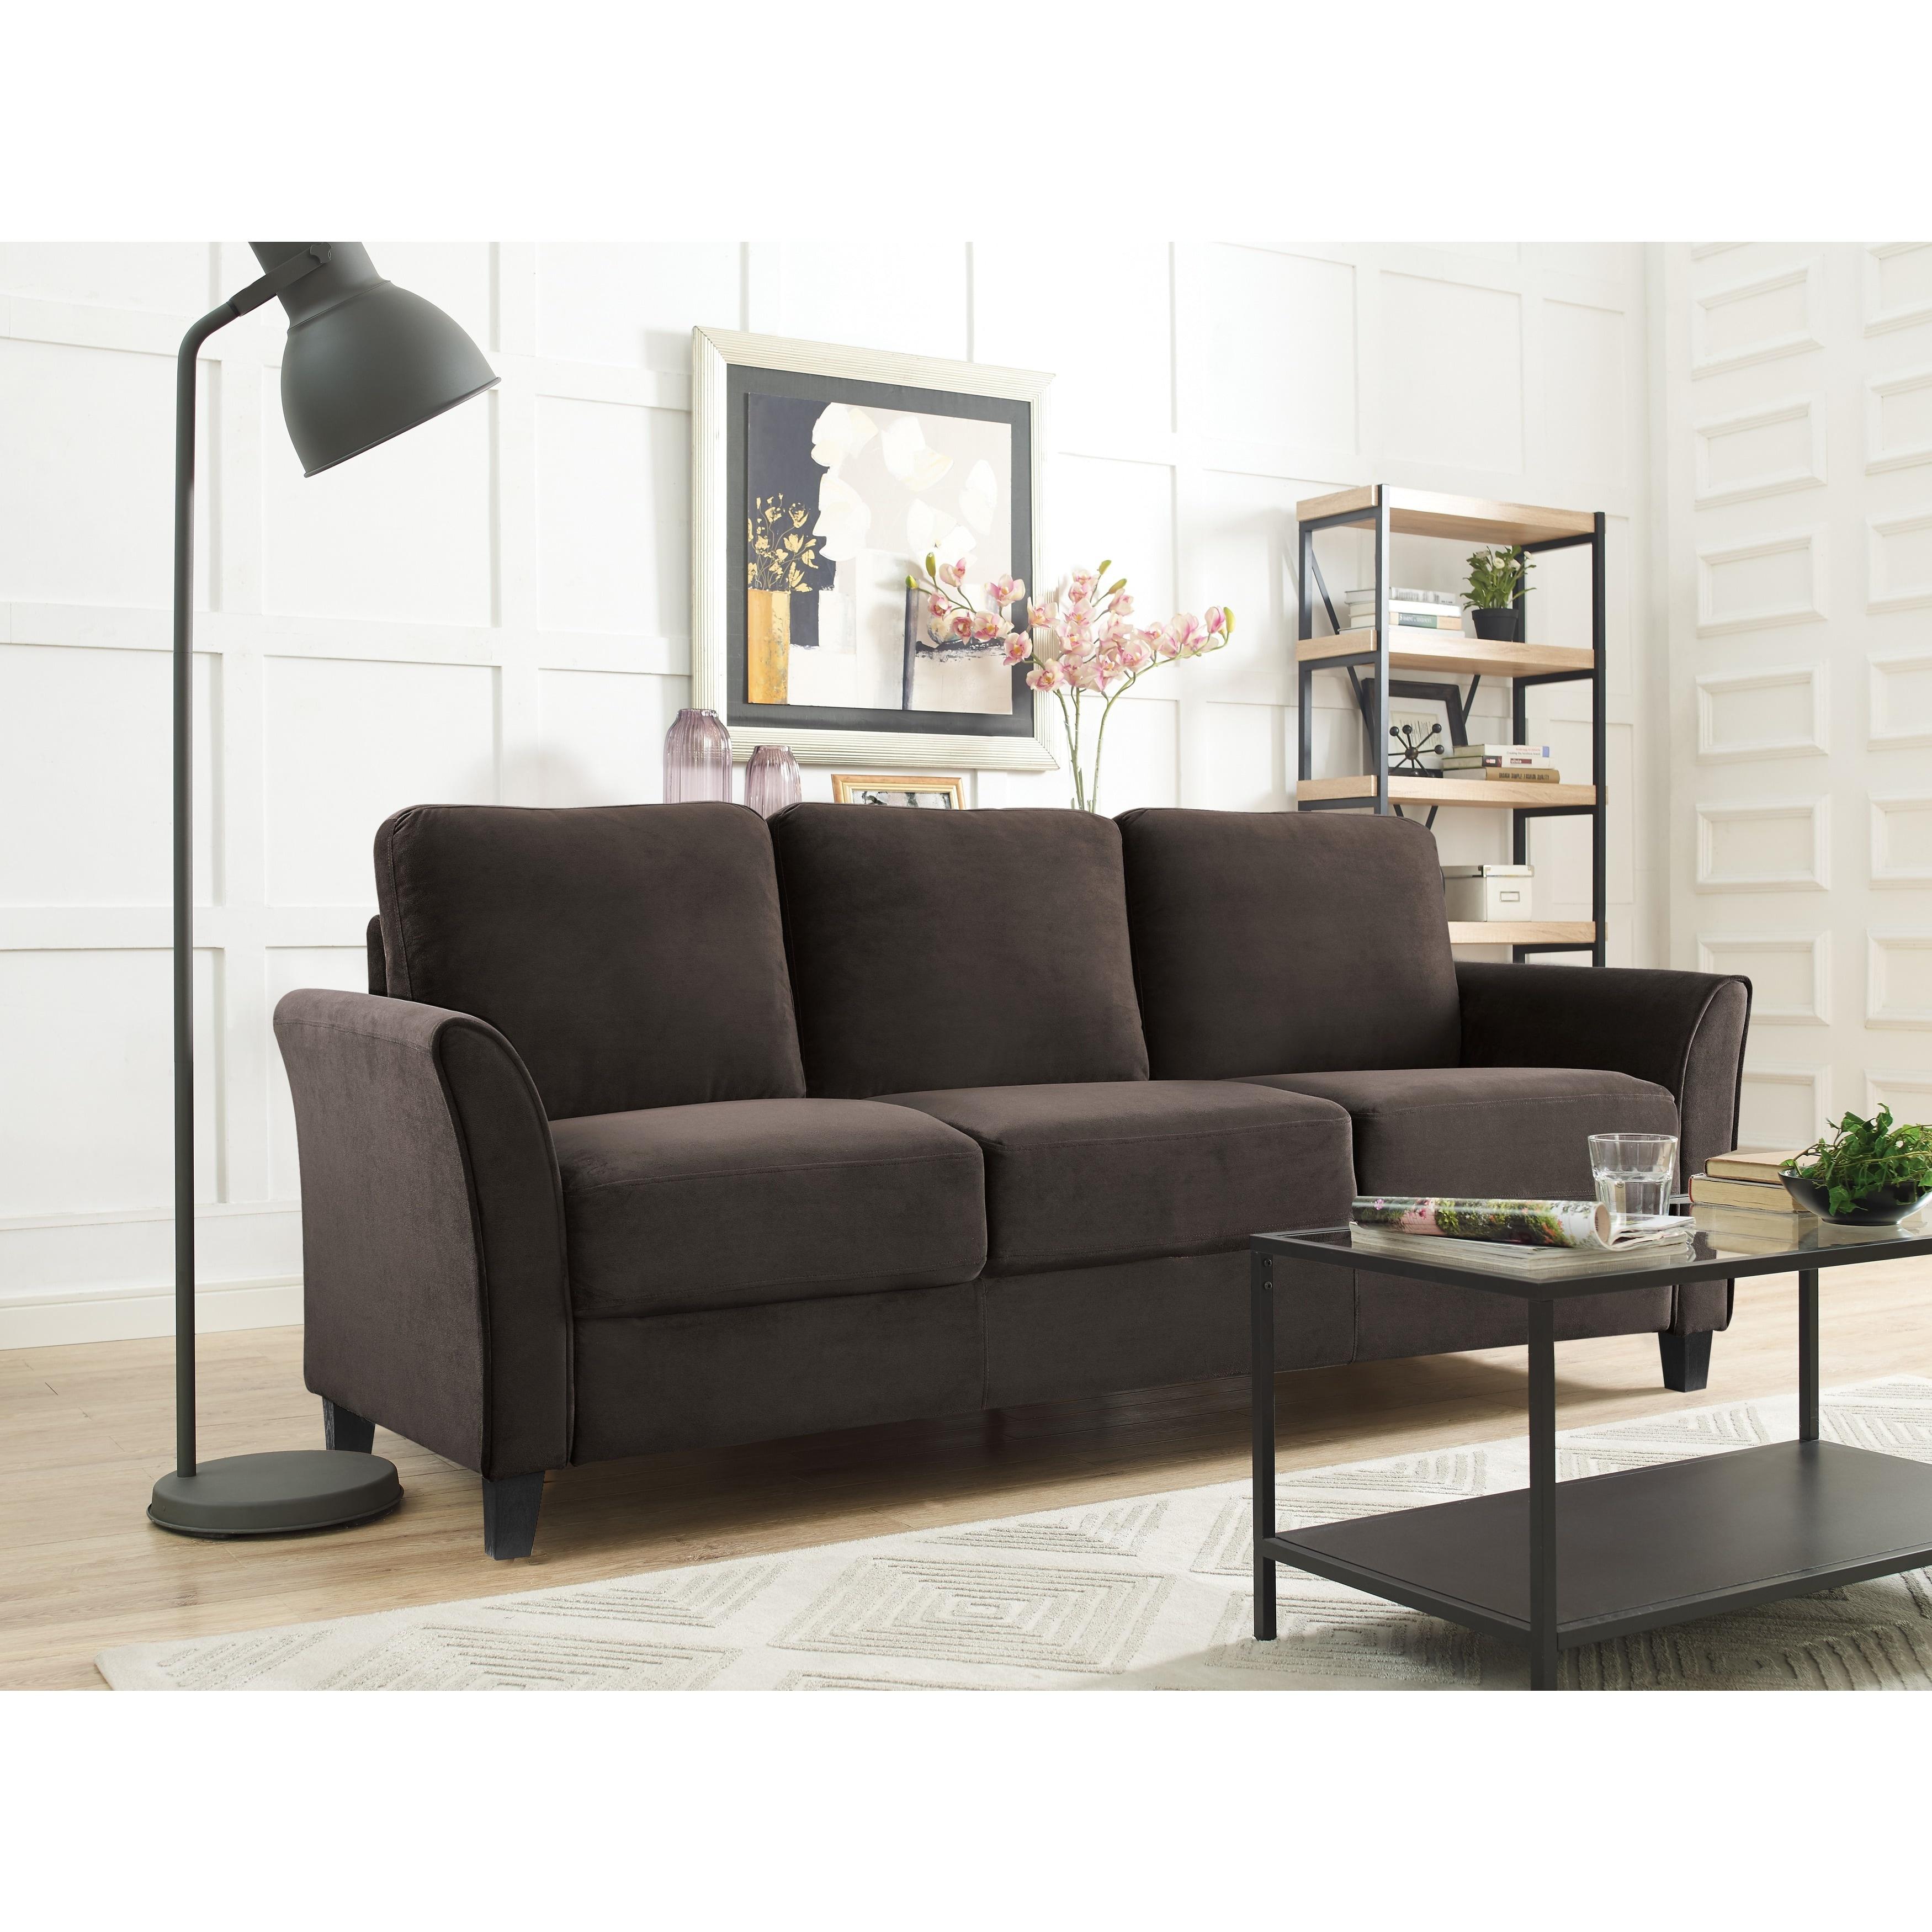 Lifestyle Solutions Waverly Sofa (Coffee), Brown (Foam)